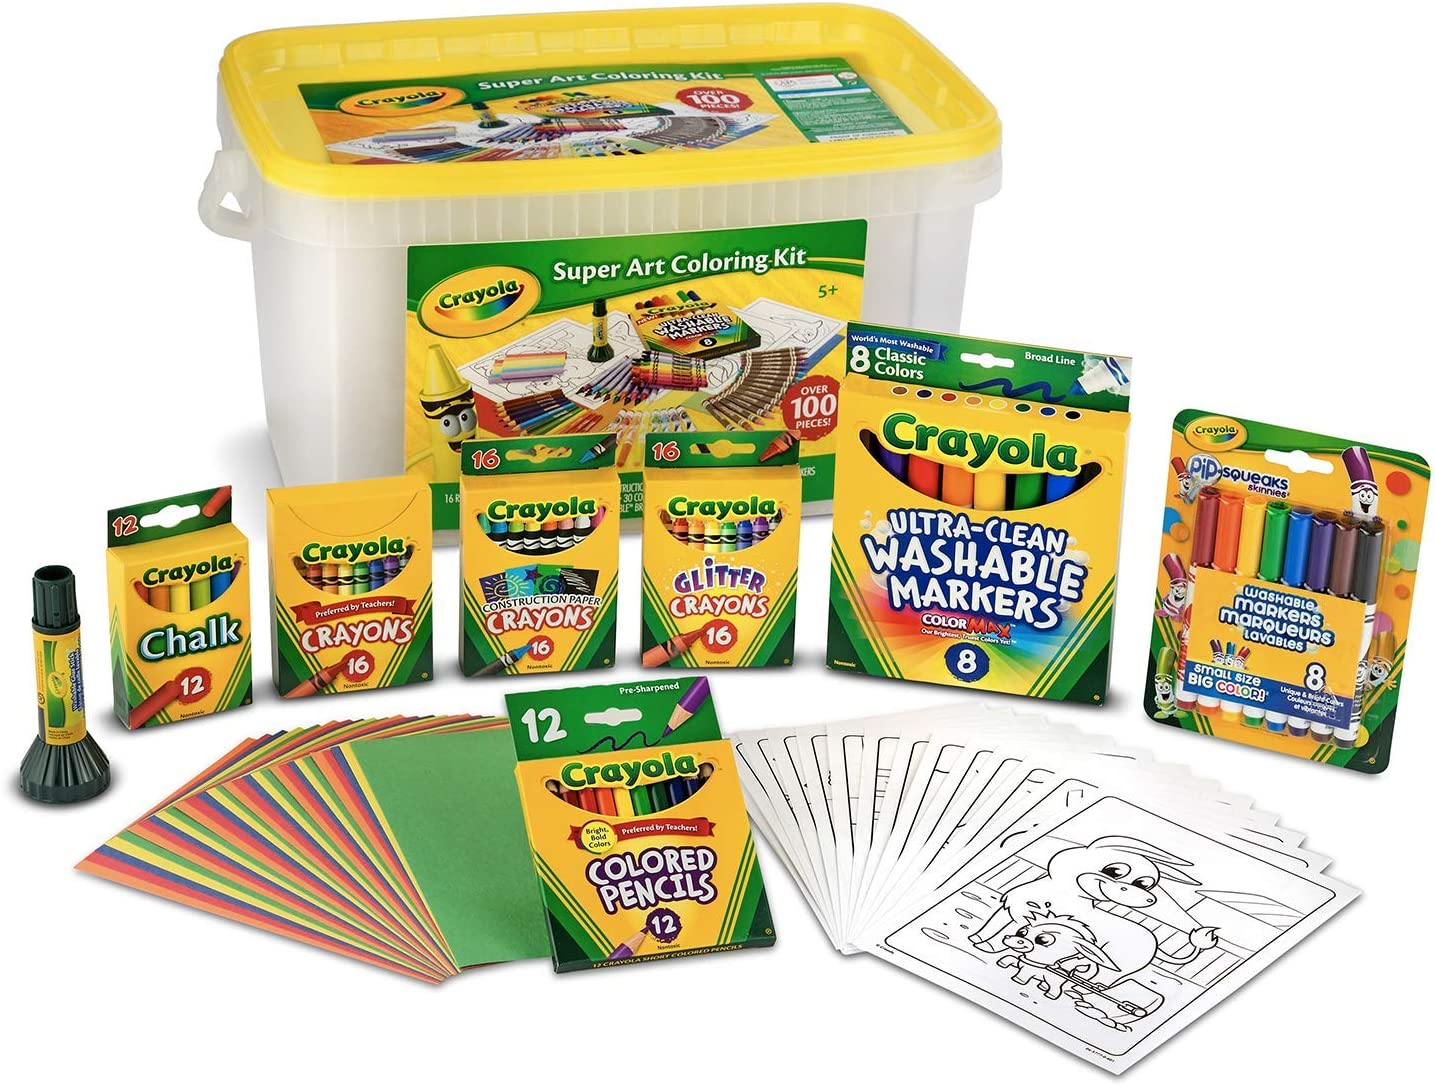 Crayola Super Kunst Coloring Kit, Gift für Kids, Over 100Piece (Amazon Exclusive)